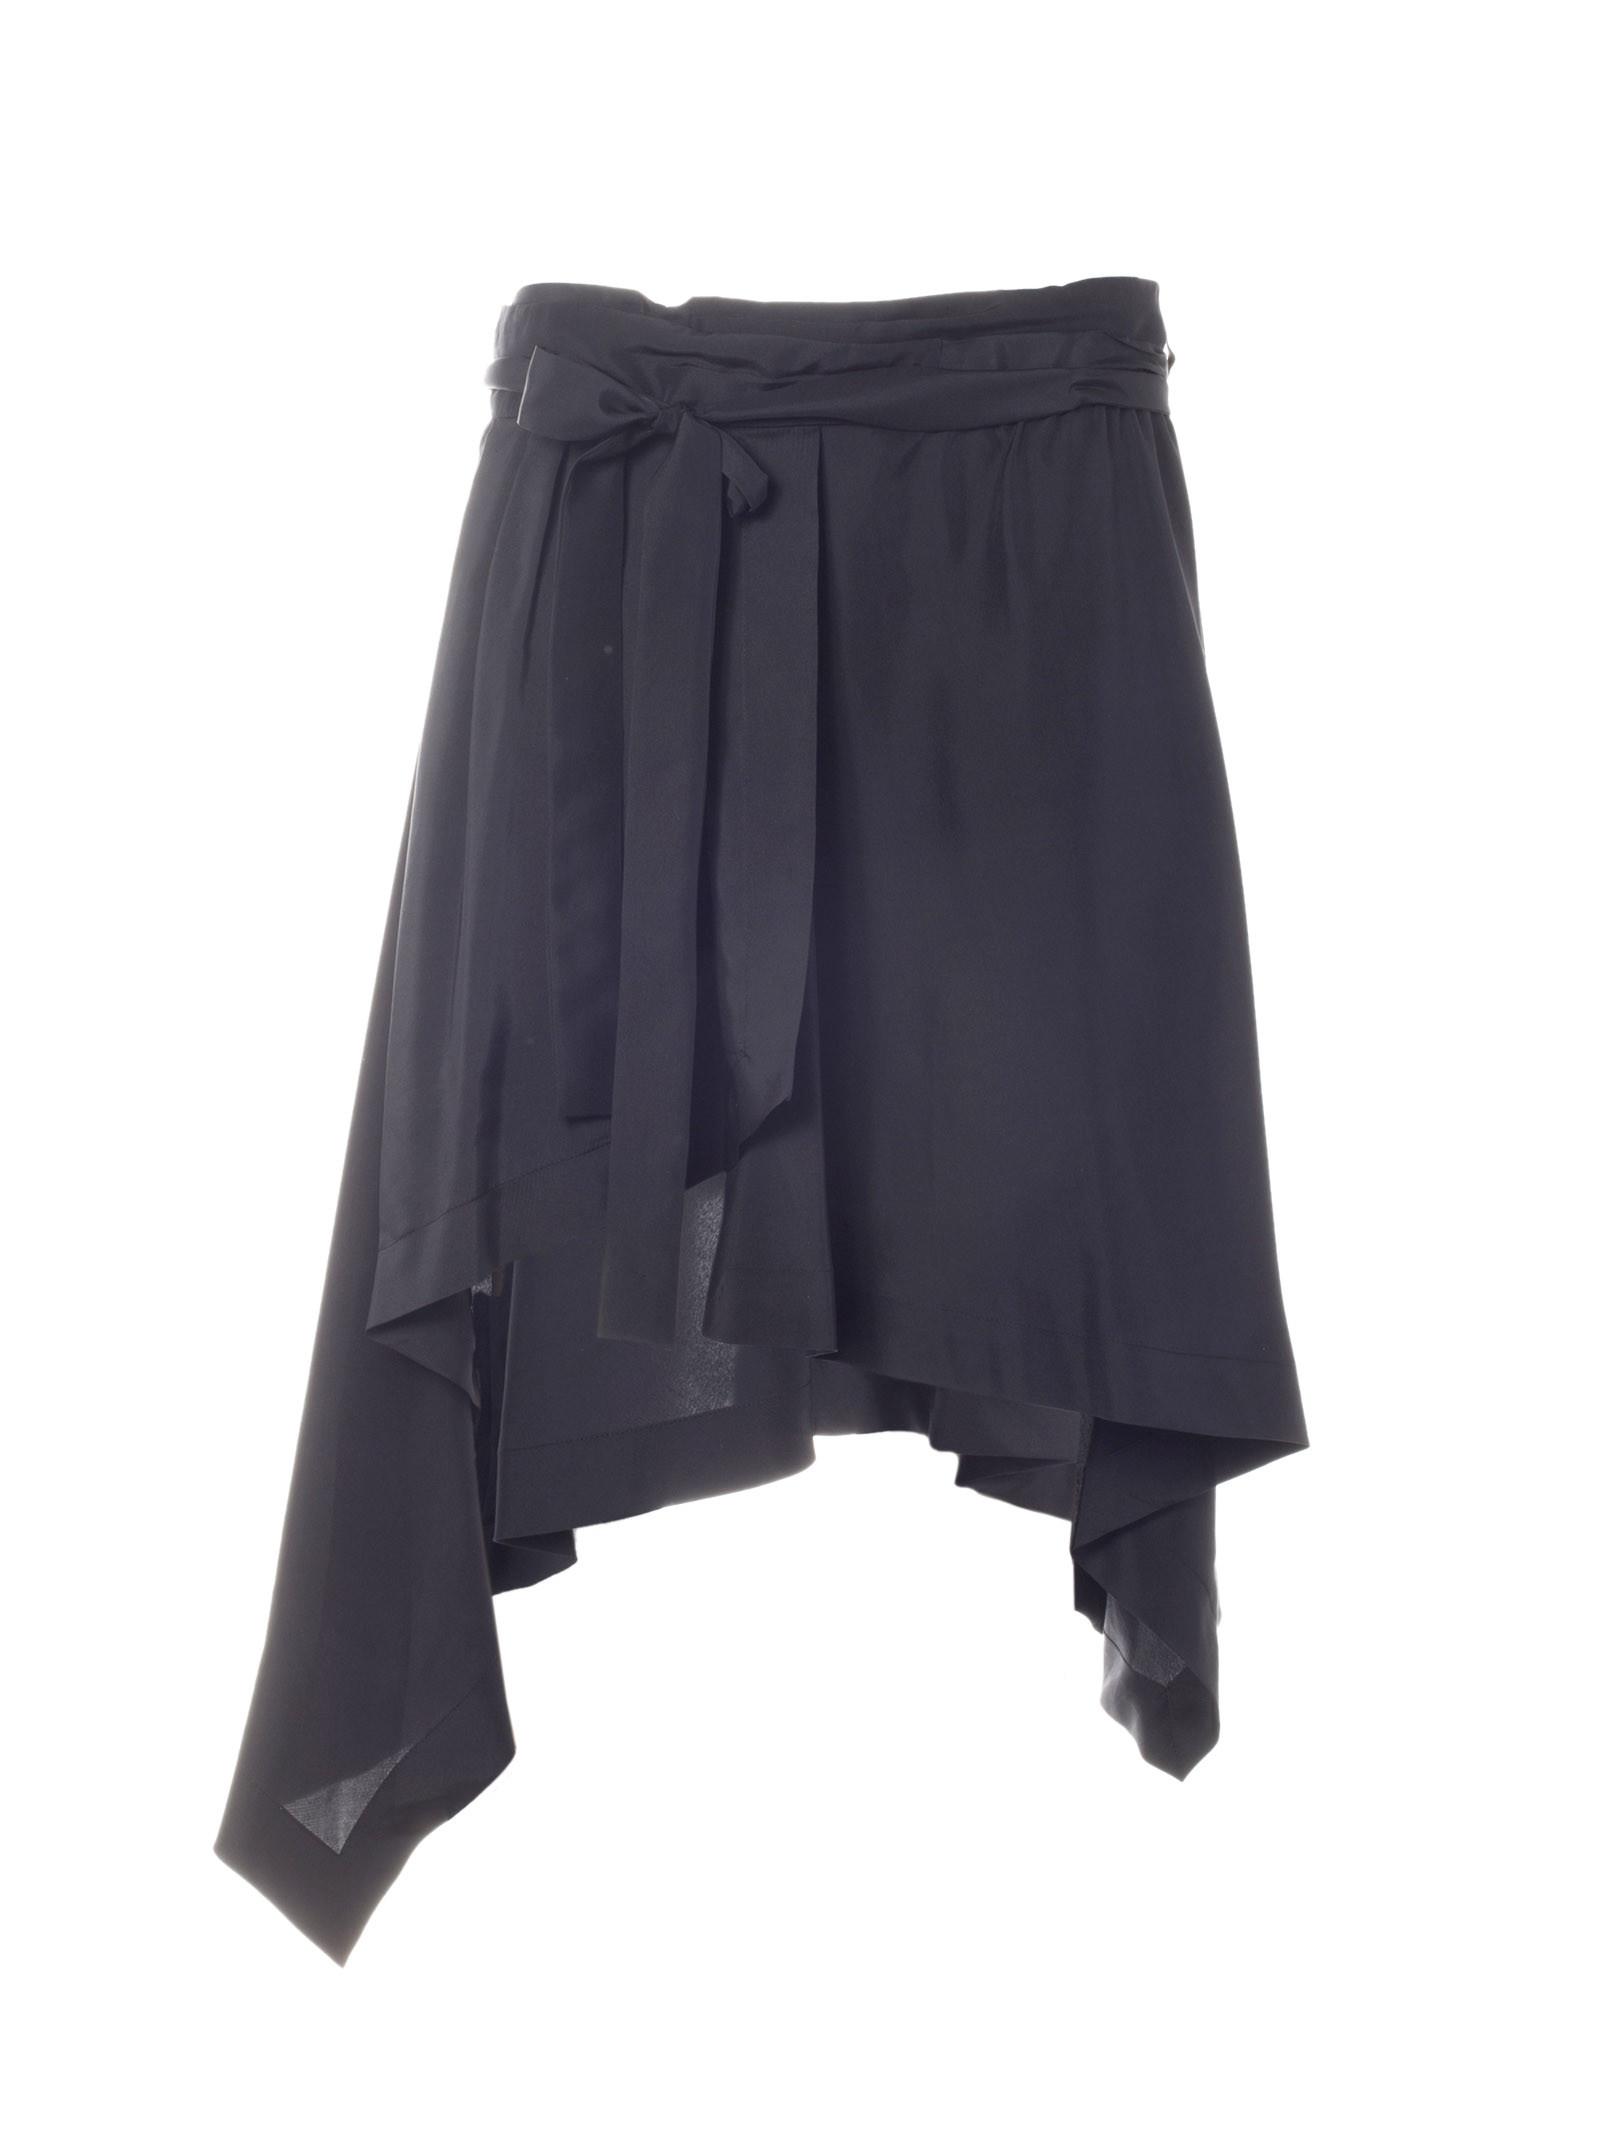 marant marant wrap around skirt pa0584